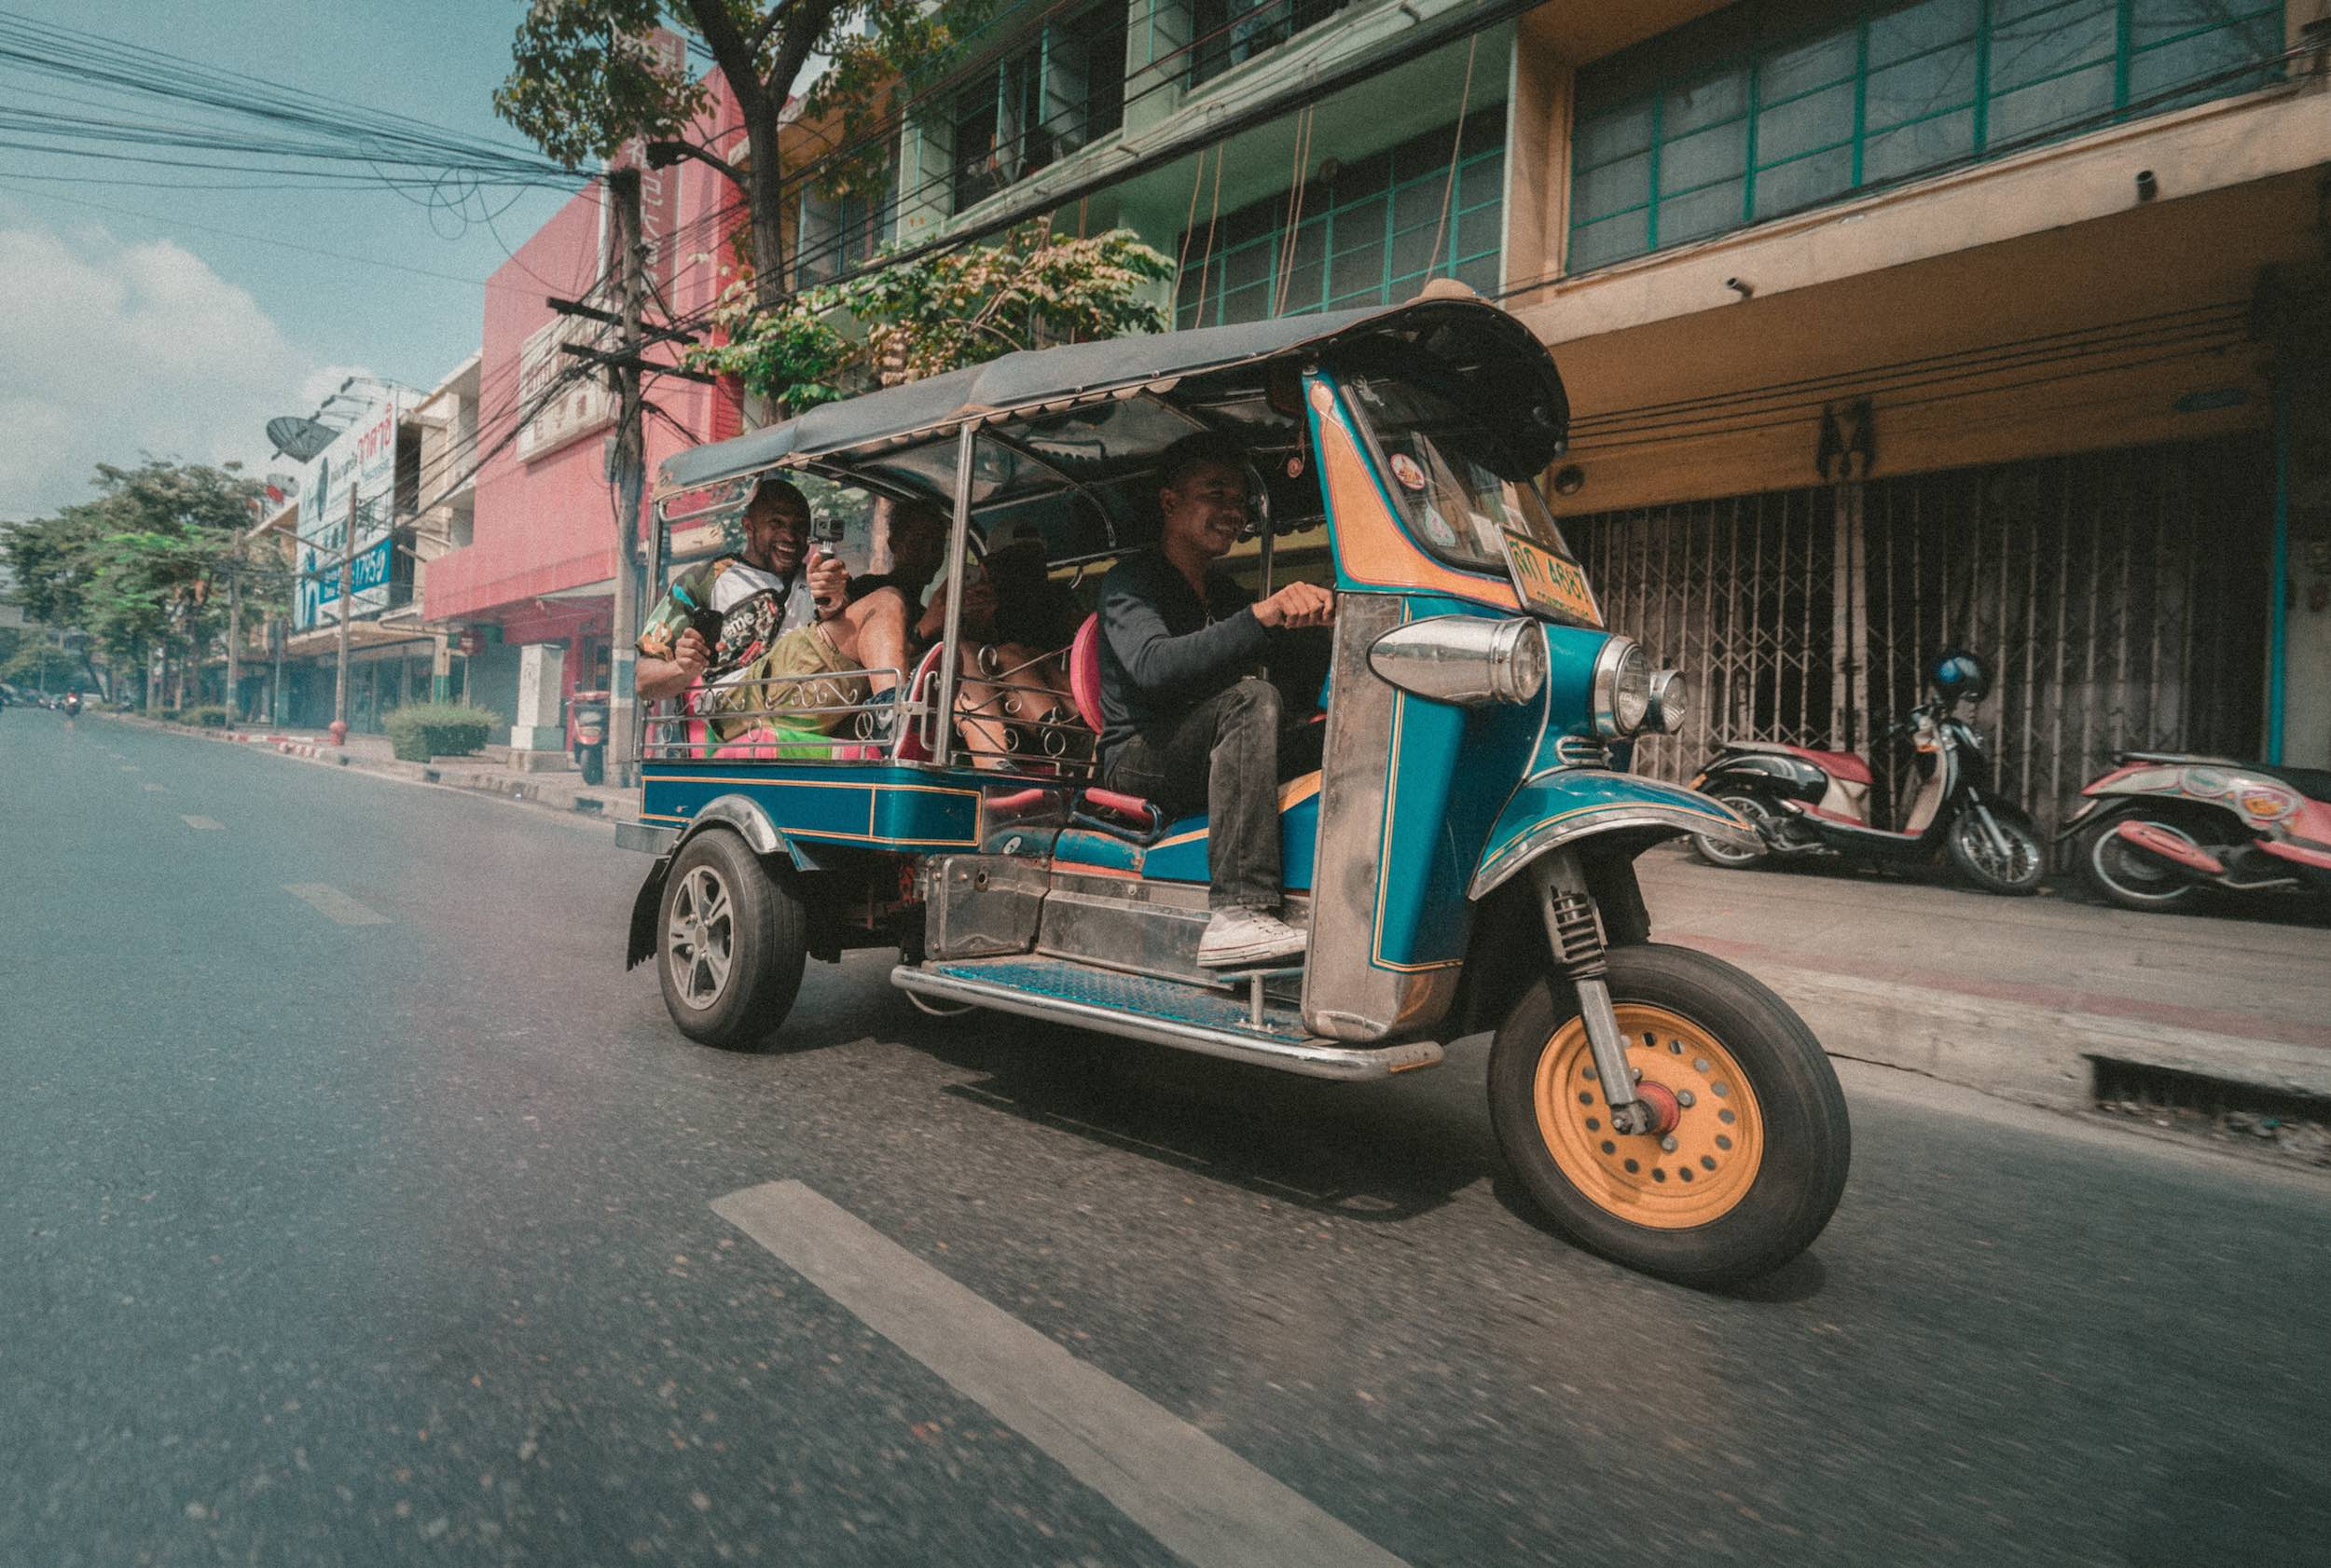 Bangkok_tuk_tuk_tourists_travel_bangkok.jpg